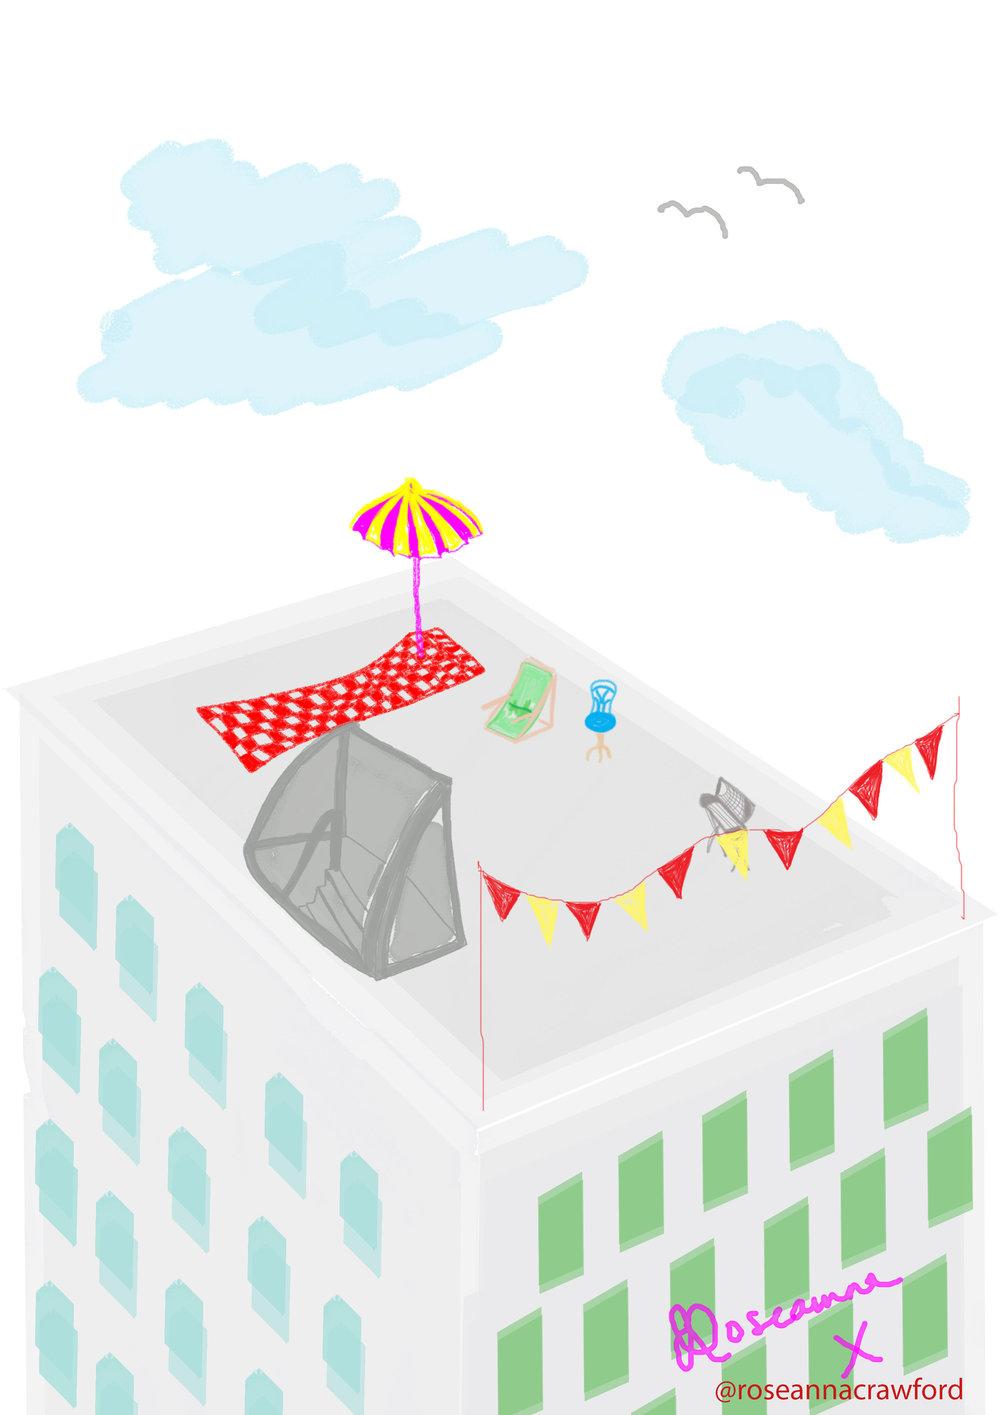 new york roof top party 1.1 website psd.jpg